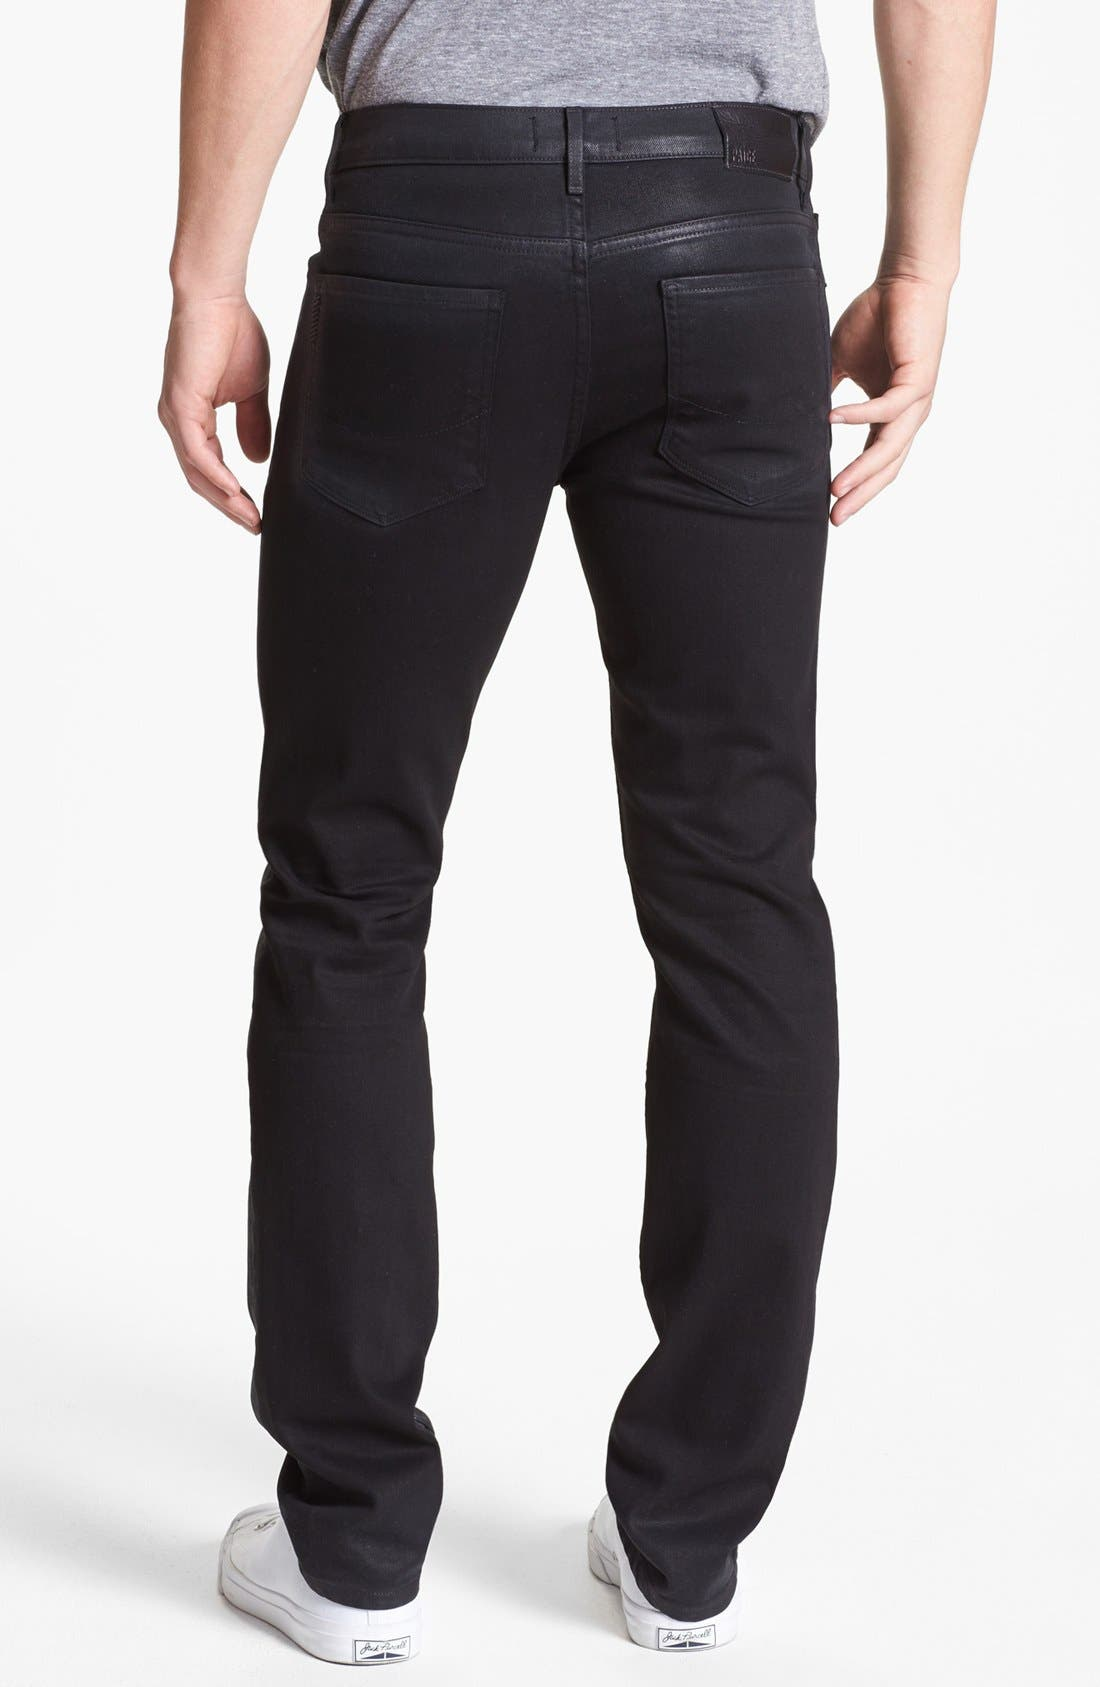 Alternate Image 1 Selected - PAIGE 'Federal' Coated Slim Fit Jeans (Oil Slick)